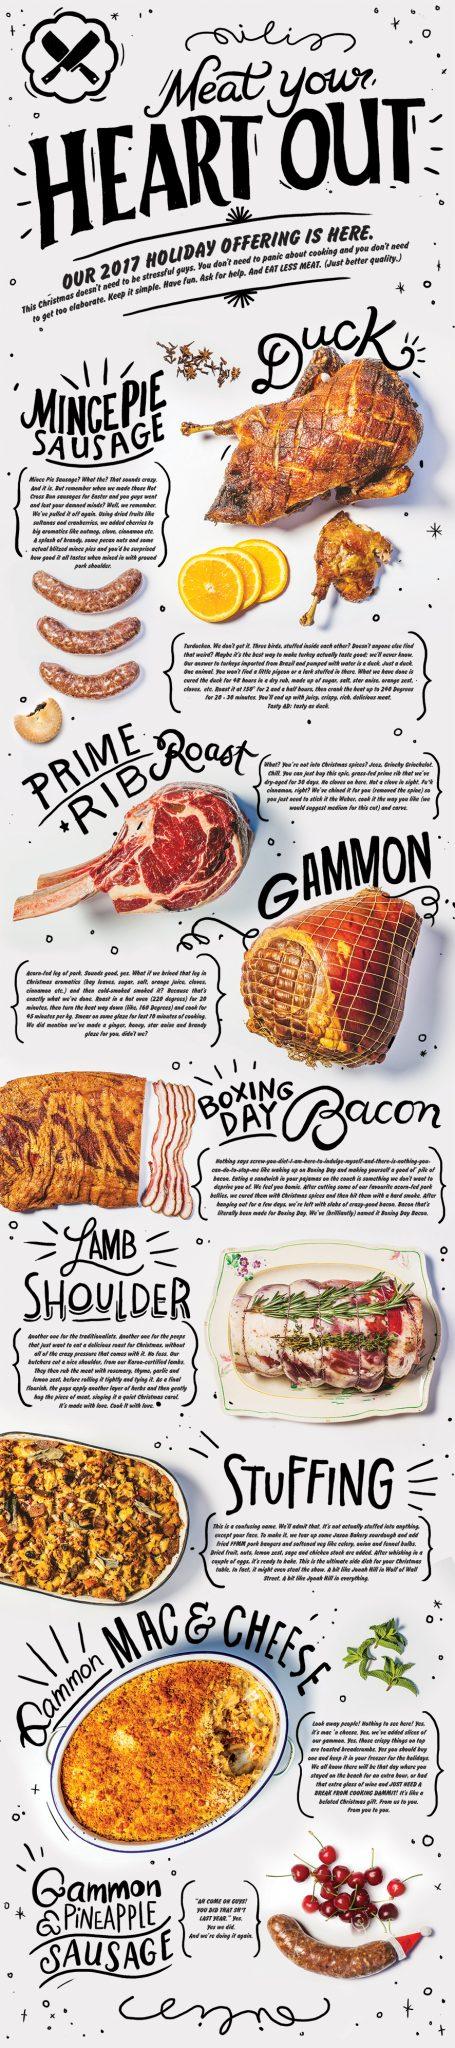 poster ffmm sonia cabano blog eatdrinkcapetown